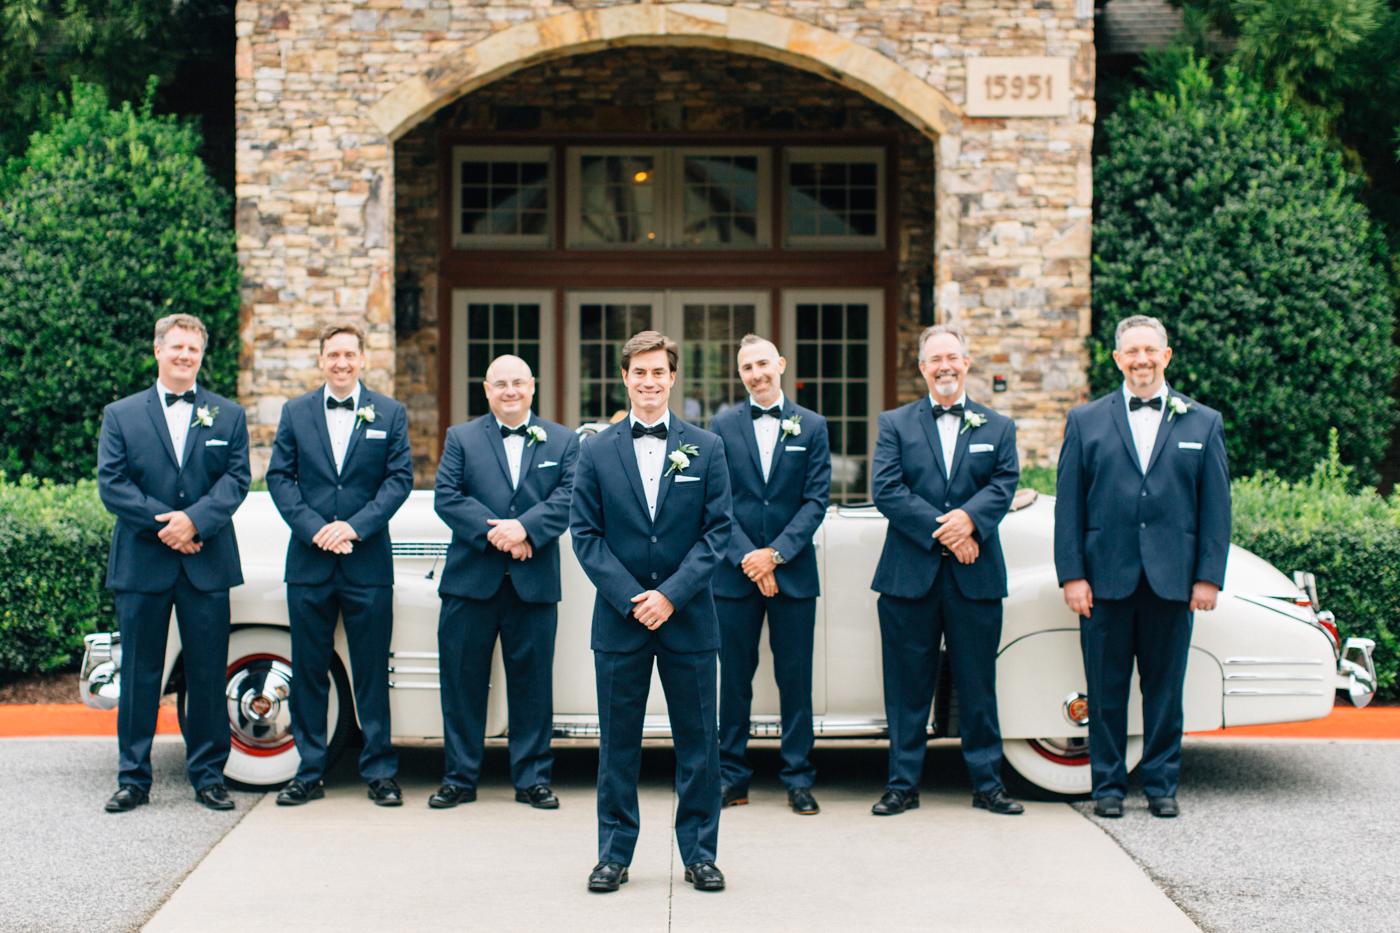 four corners photography best atlanta wedding photographer the manor golf and country club wedding photos southern weddings bride magazine wedding photos atlanta photographer-30.jpg